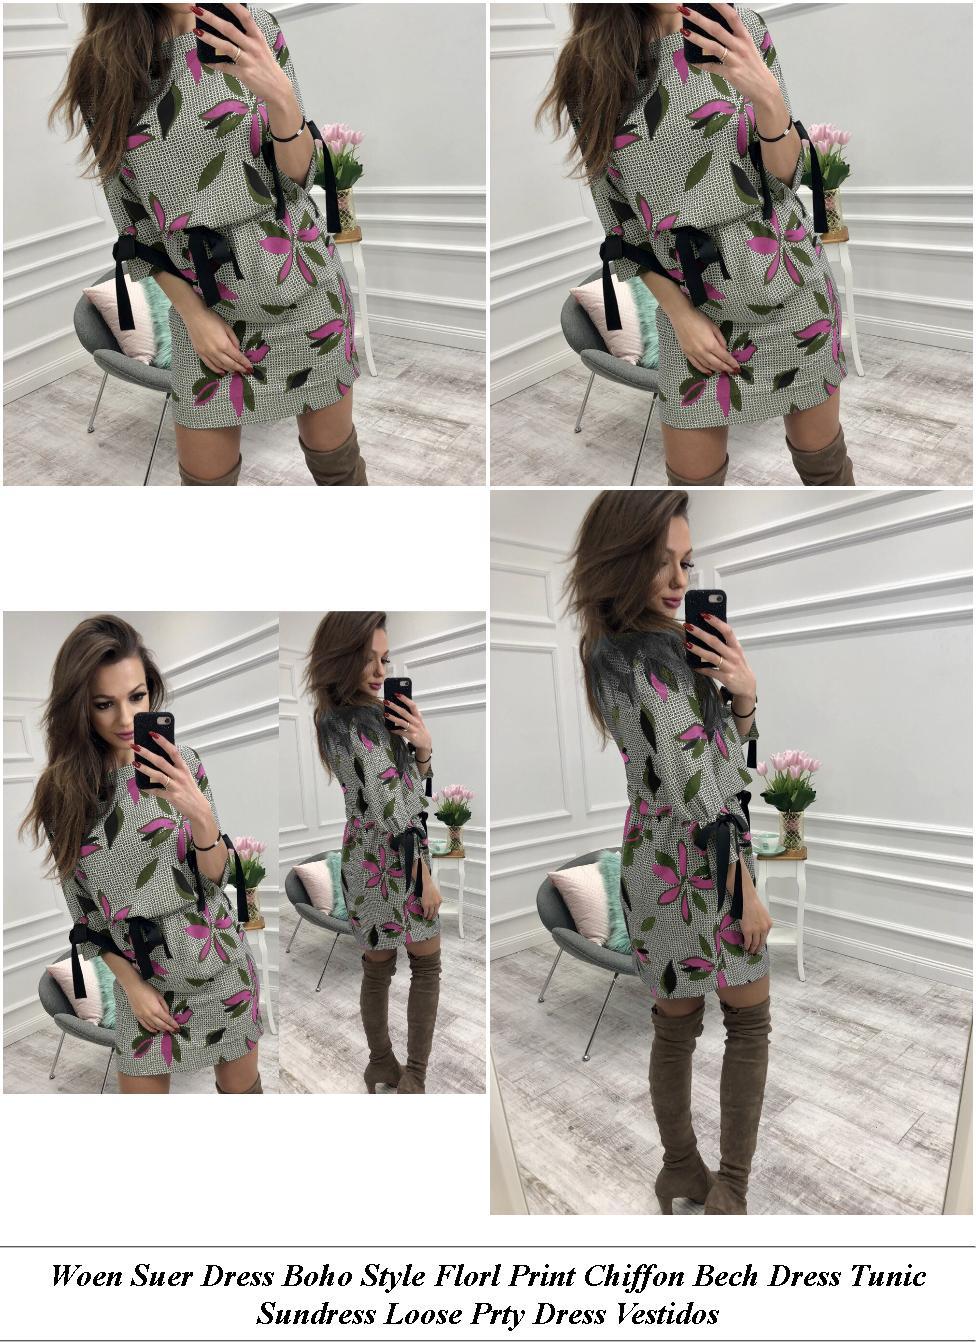 Long Dresses Online Canada - All Clad On Sale - Cocktail Party Dresses Plus Size